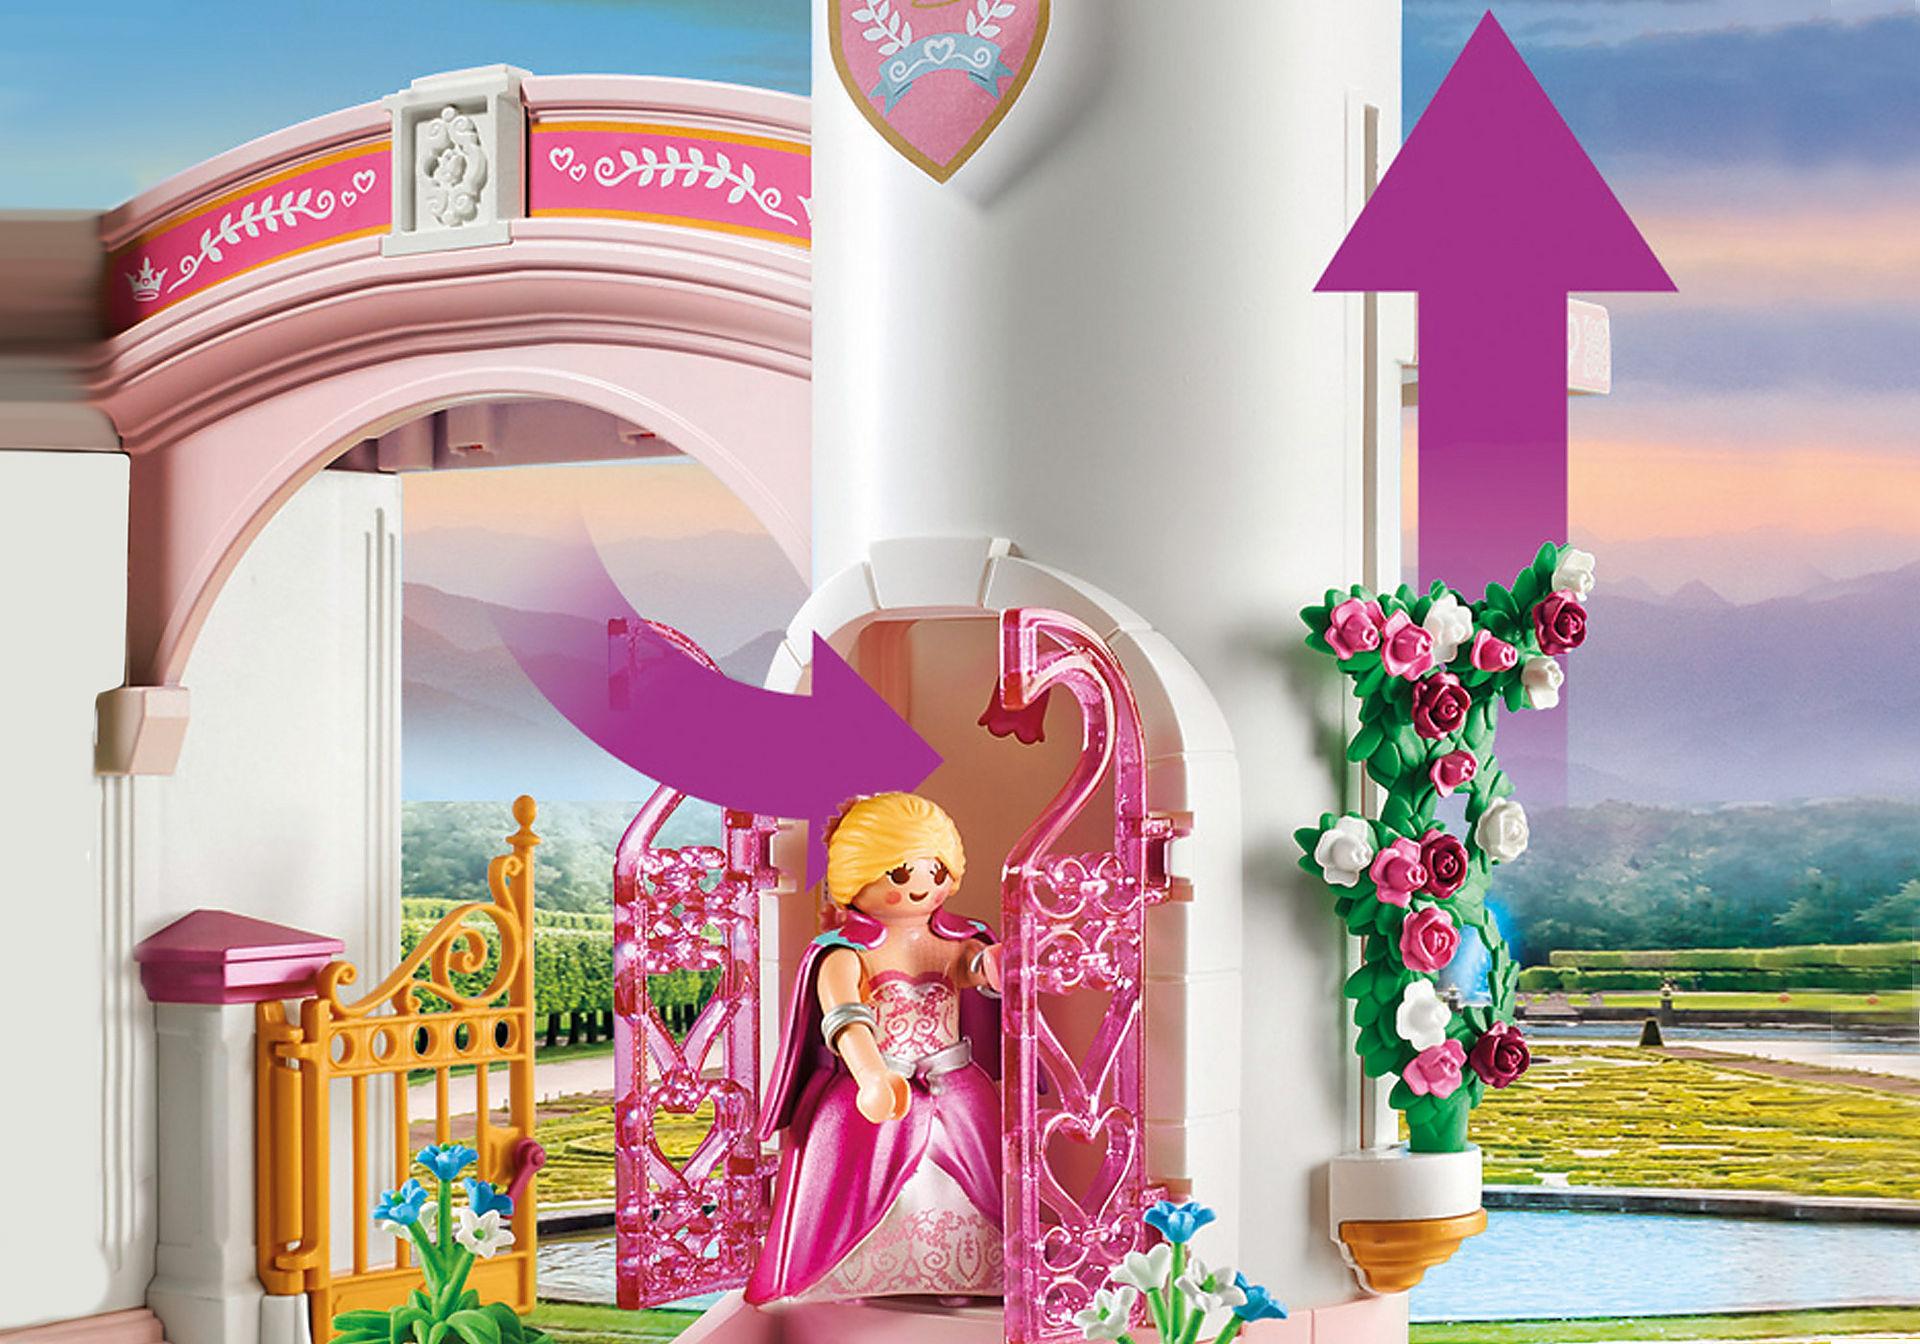 70448 Palais de princesse zoom image4